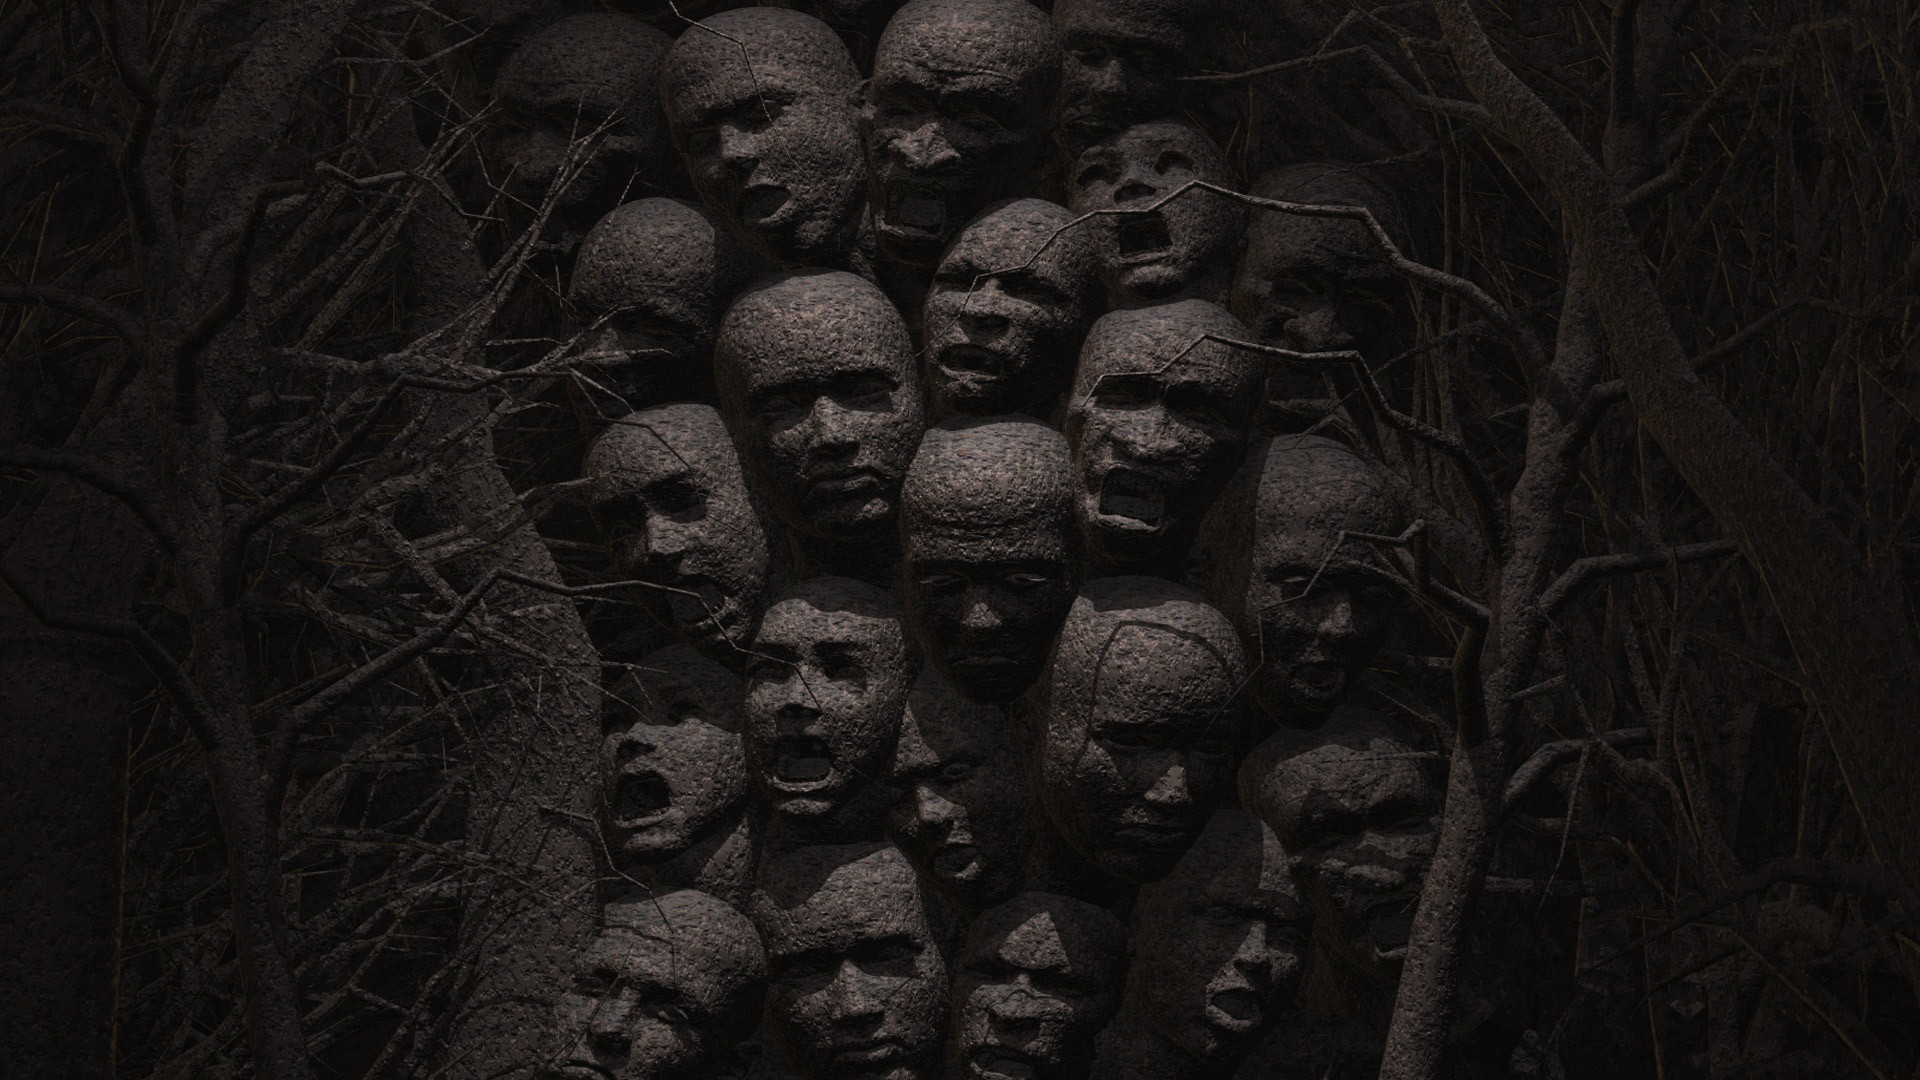 Dark Horror Evil Gothic Scream Face Mask Death Sad Sorrow Angry Pain Art Wallpaper